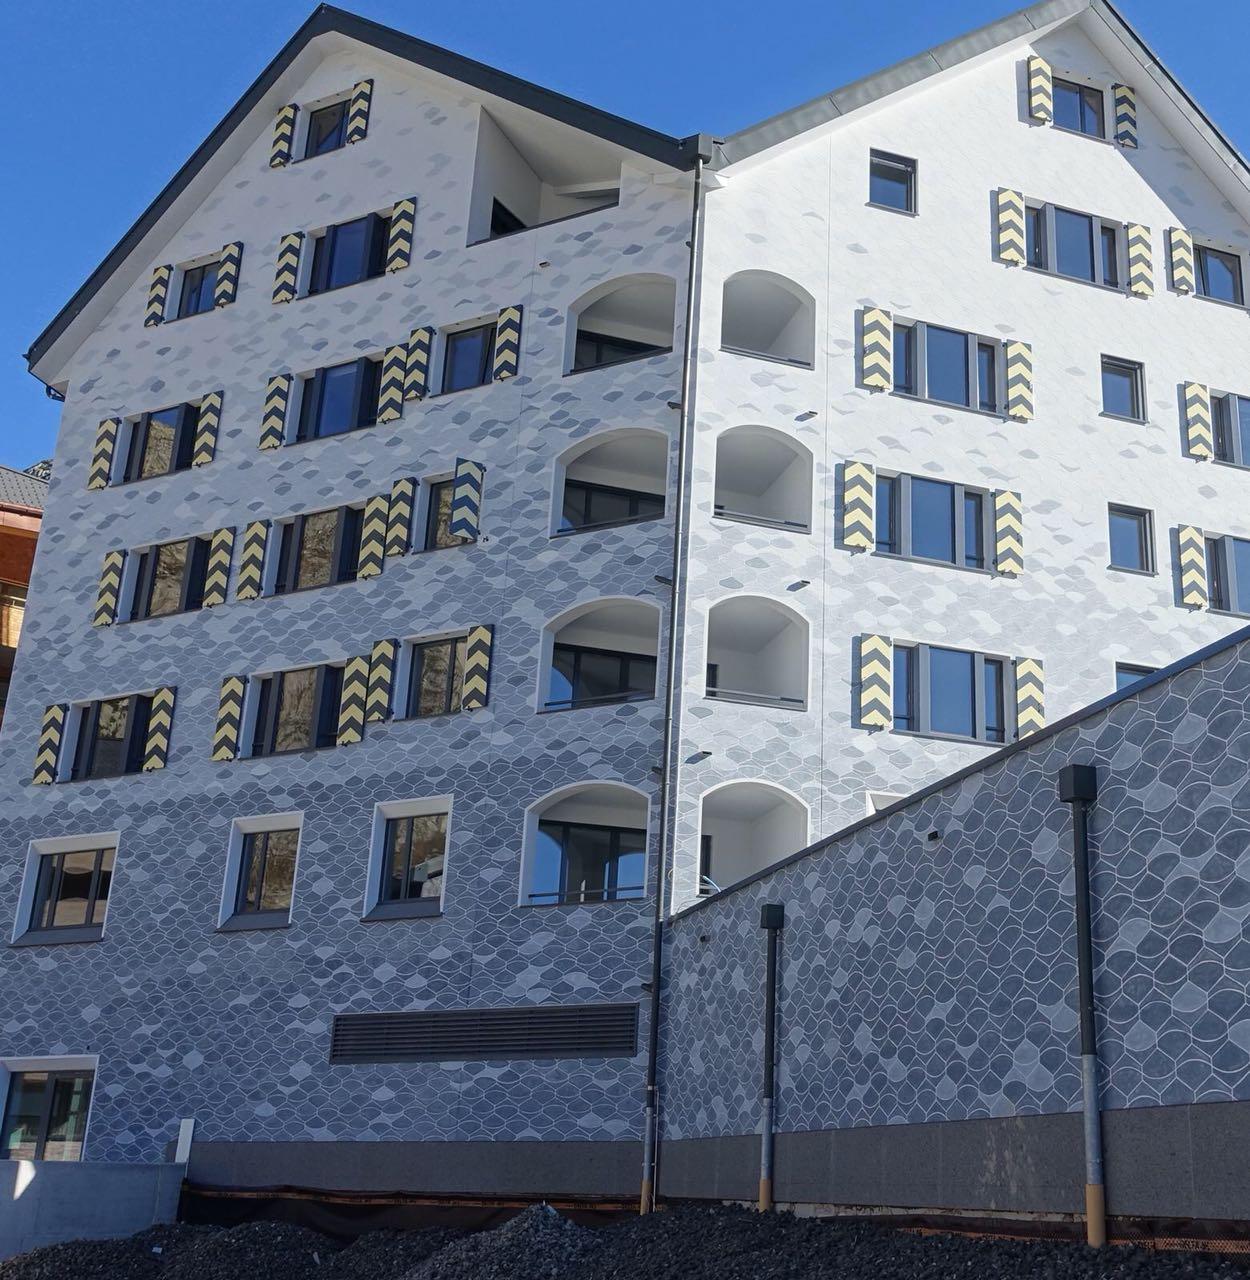 BEECK Concrete Stone Glaze Project - Swiss Alps Resort Edelweiss 2